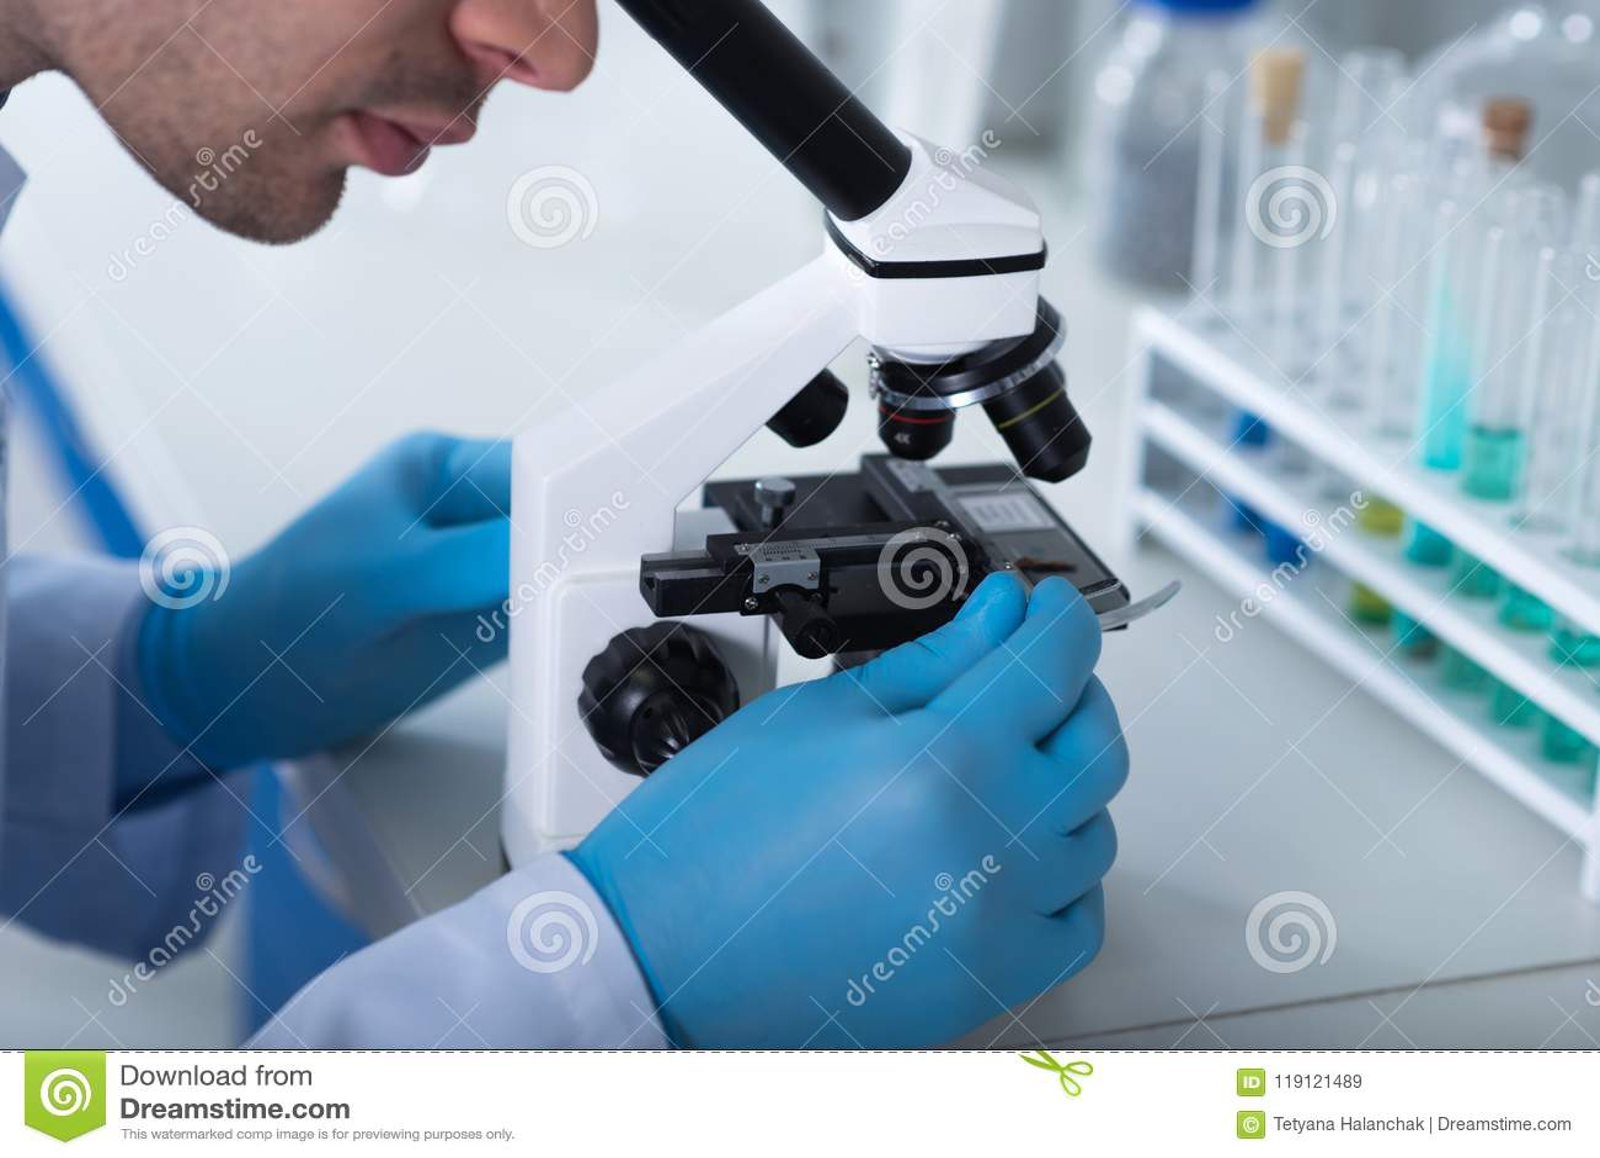 Adult Unshaken Explorer Sitting And Using The Microscope